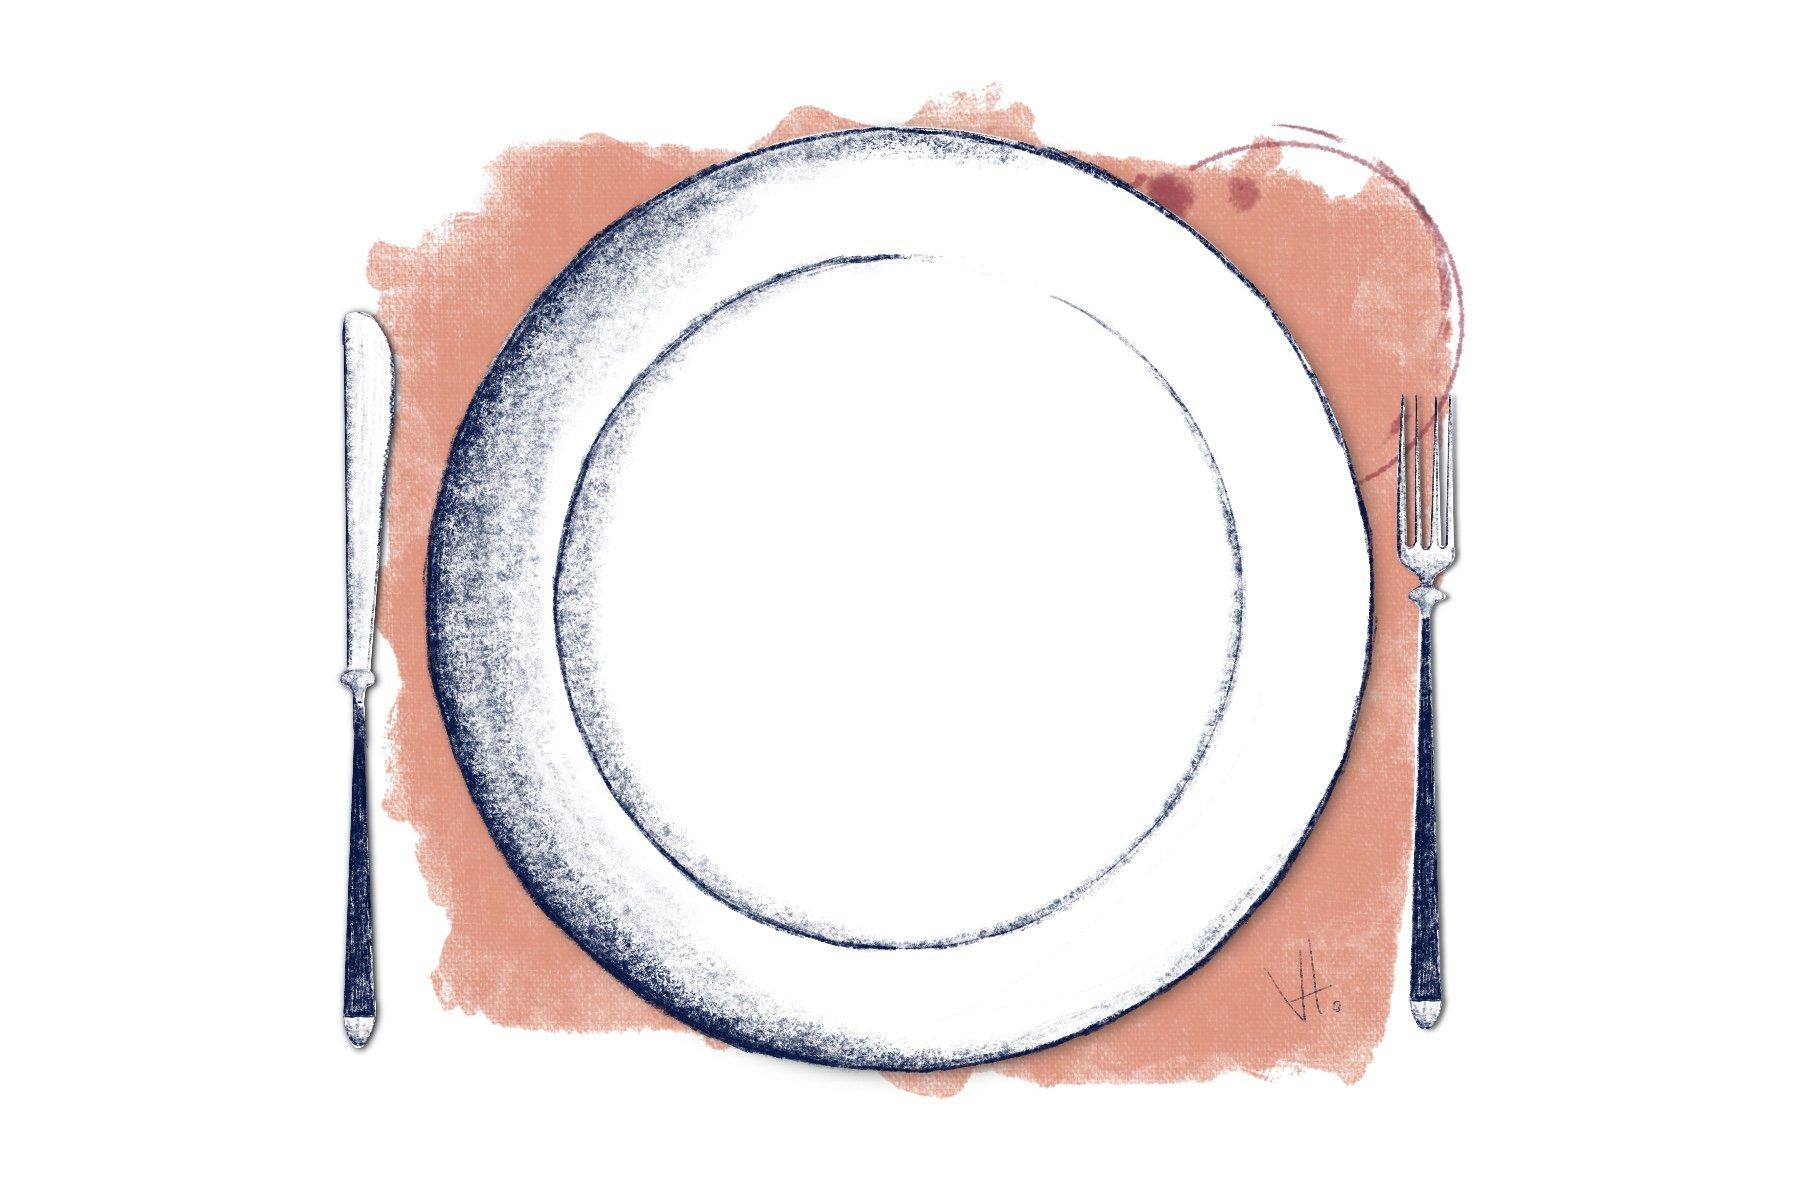 Design Teller Plate Visual Content Creation